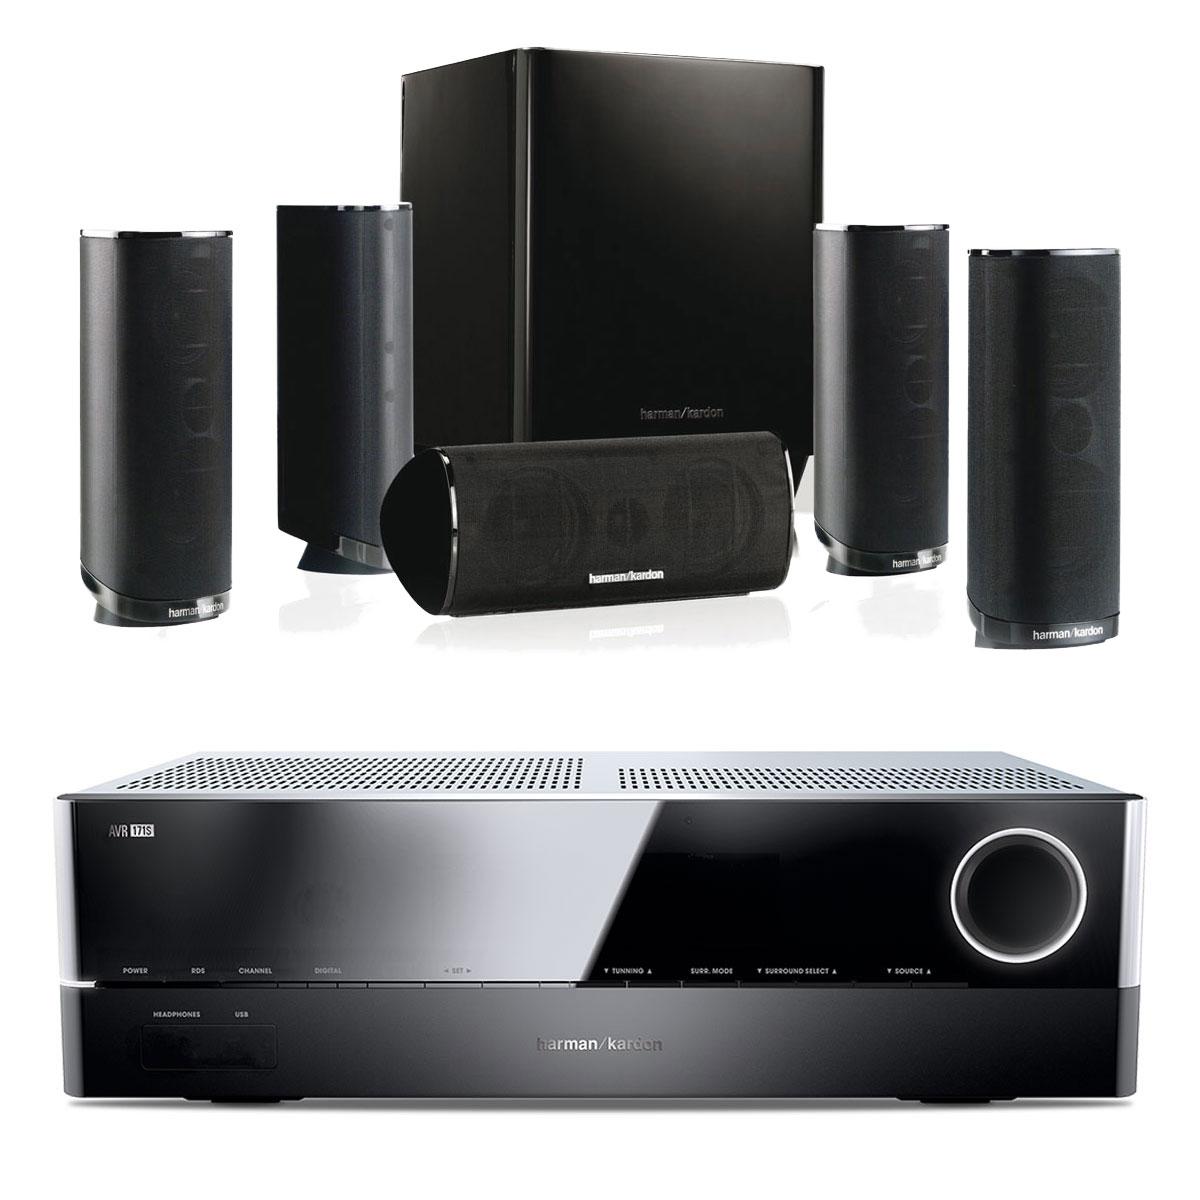 Ensemble home cinéma Harman Kardon AVR 171S + Harman Kardon HKTS 16 Amplificateur 7.2 - 100 W DLNA Bluetooth Spotify HDMI + Pack d'enceintes 5.1